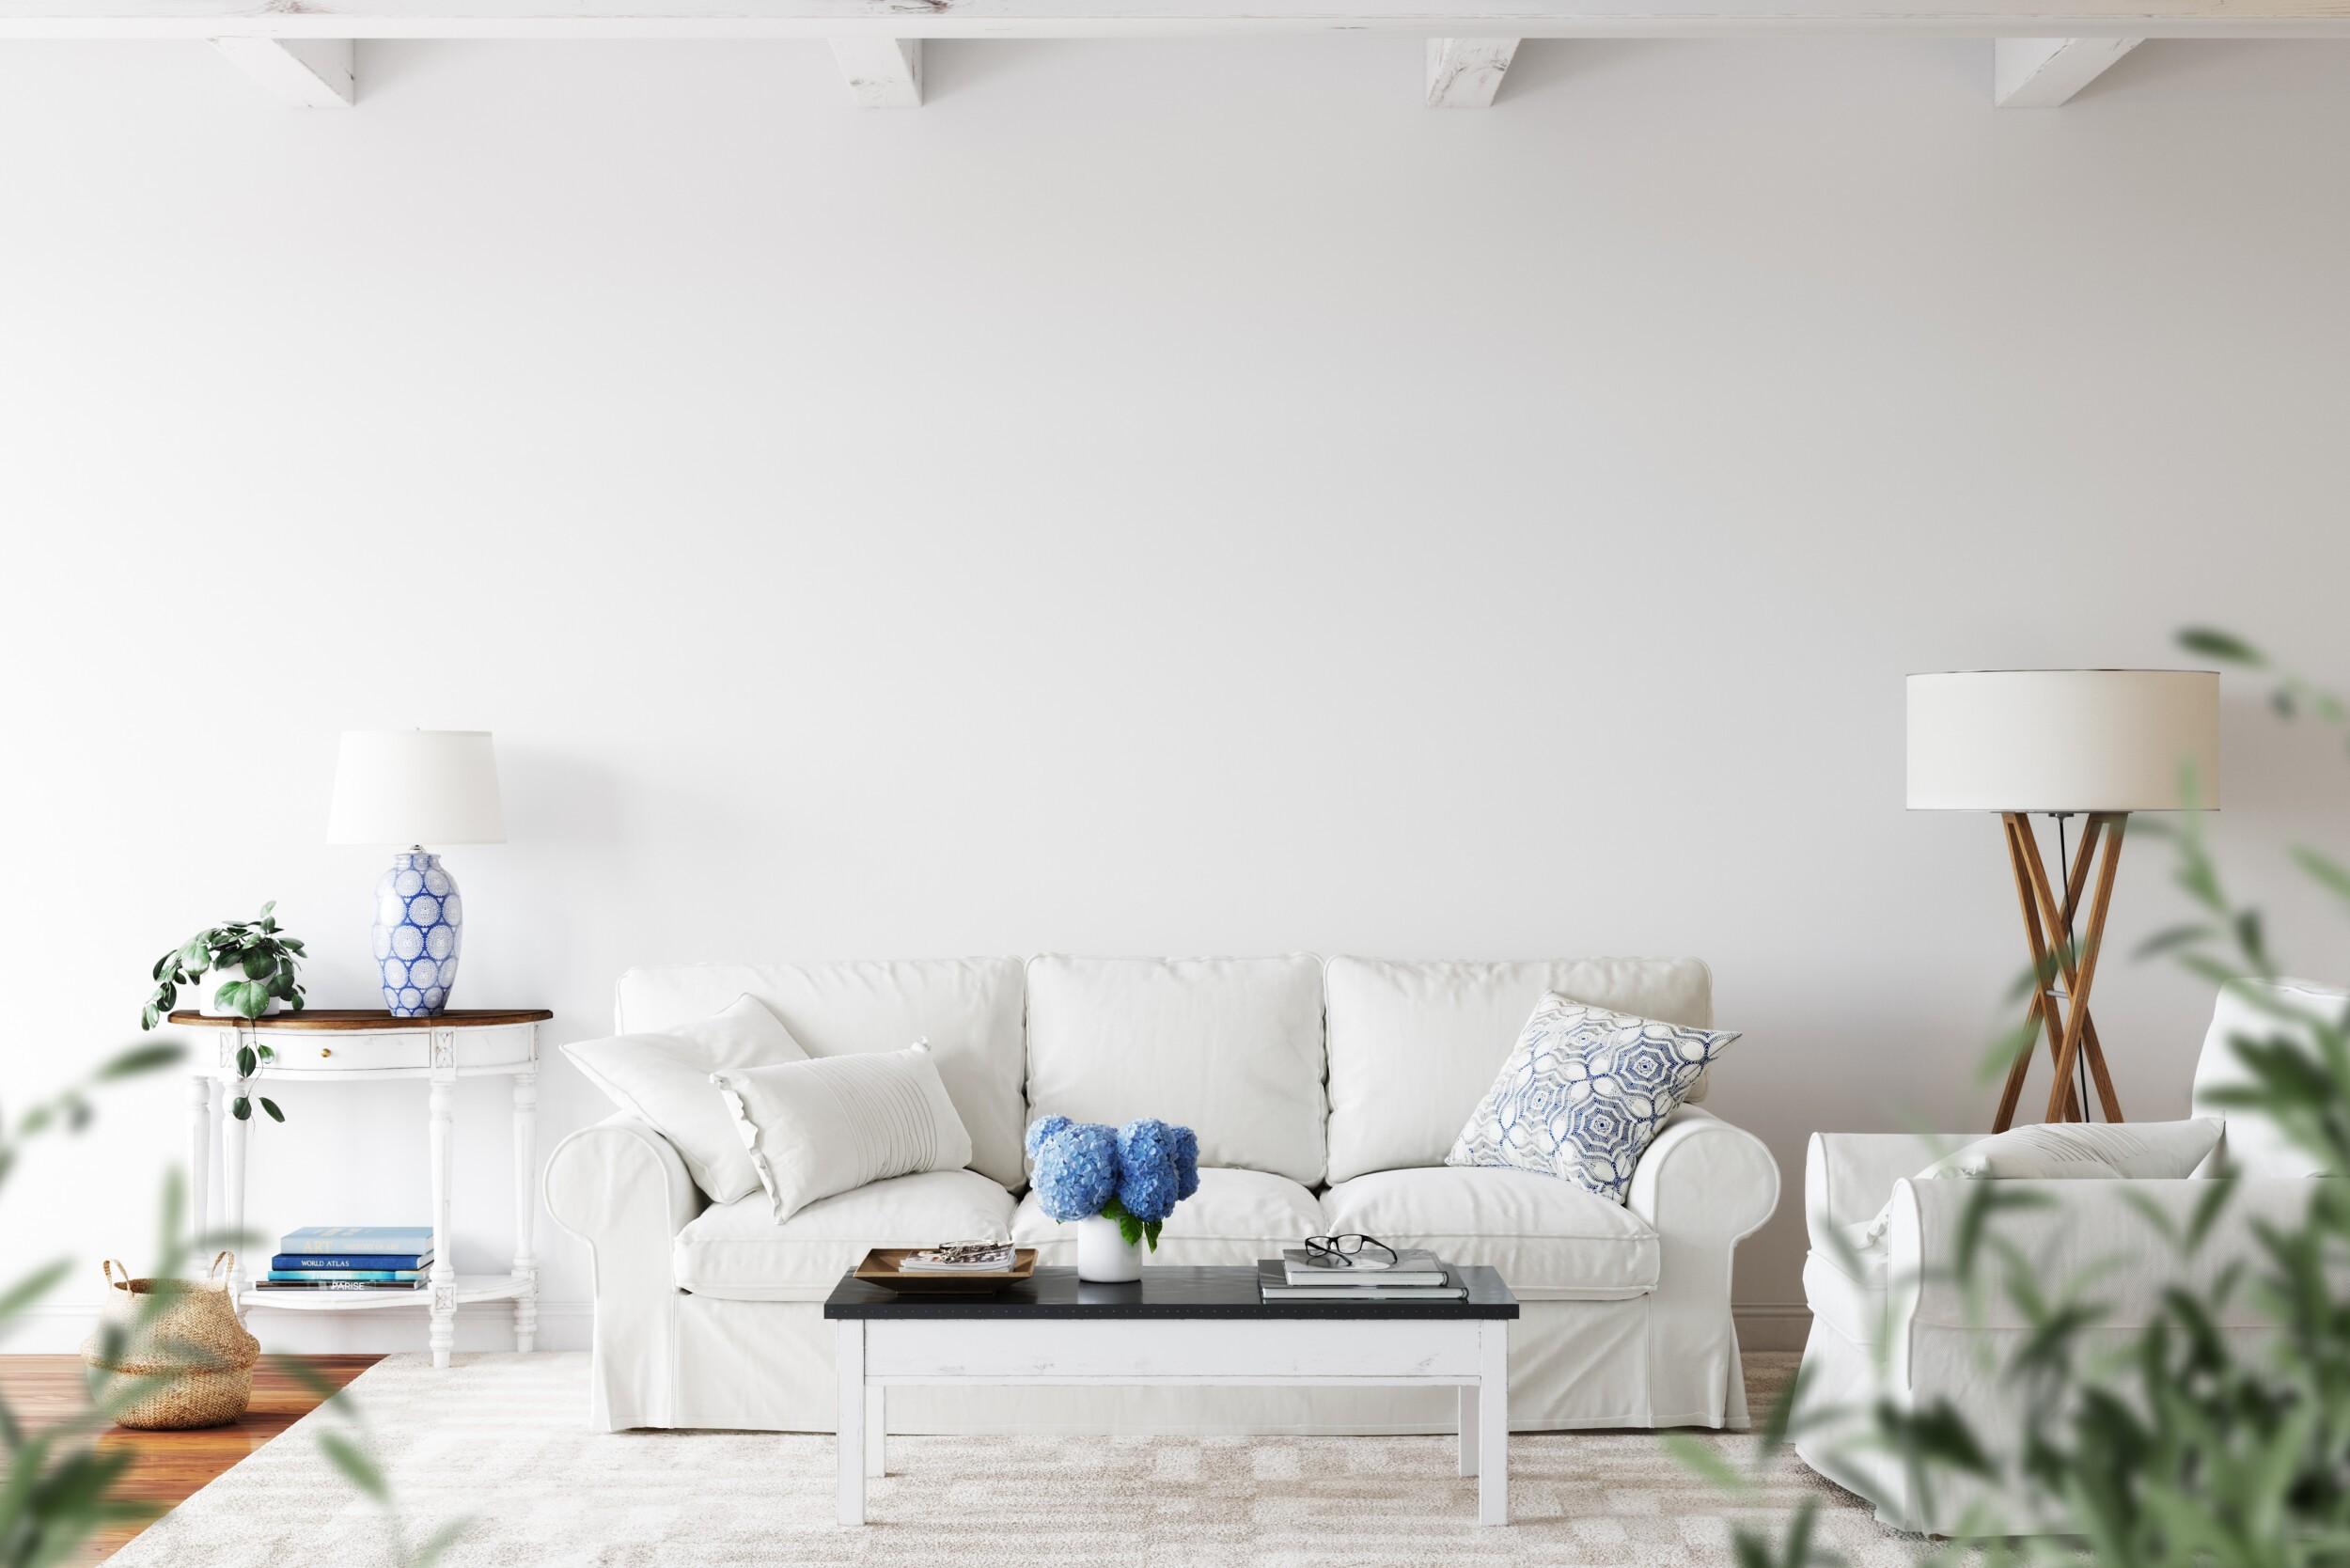 Coastal Scandinavian interior style